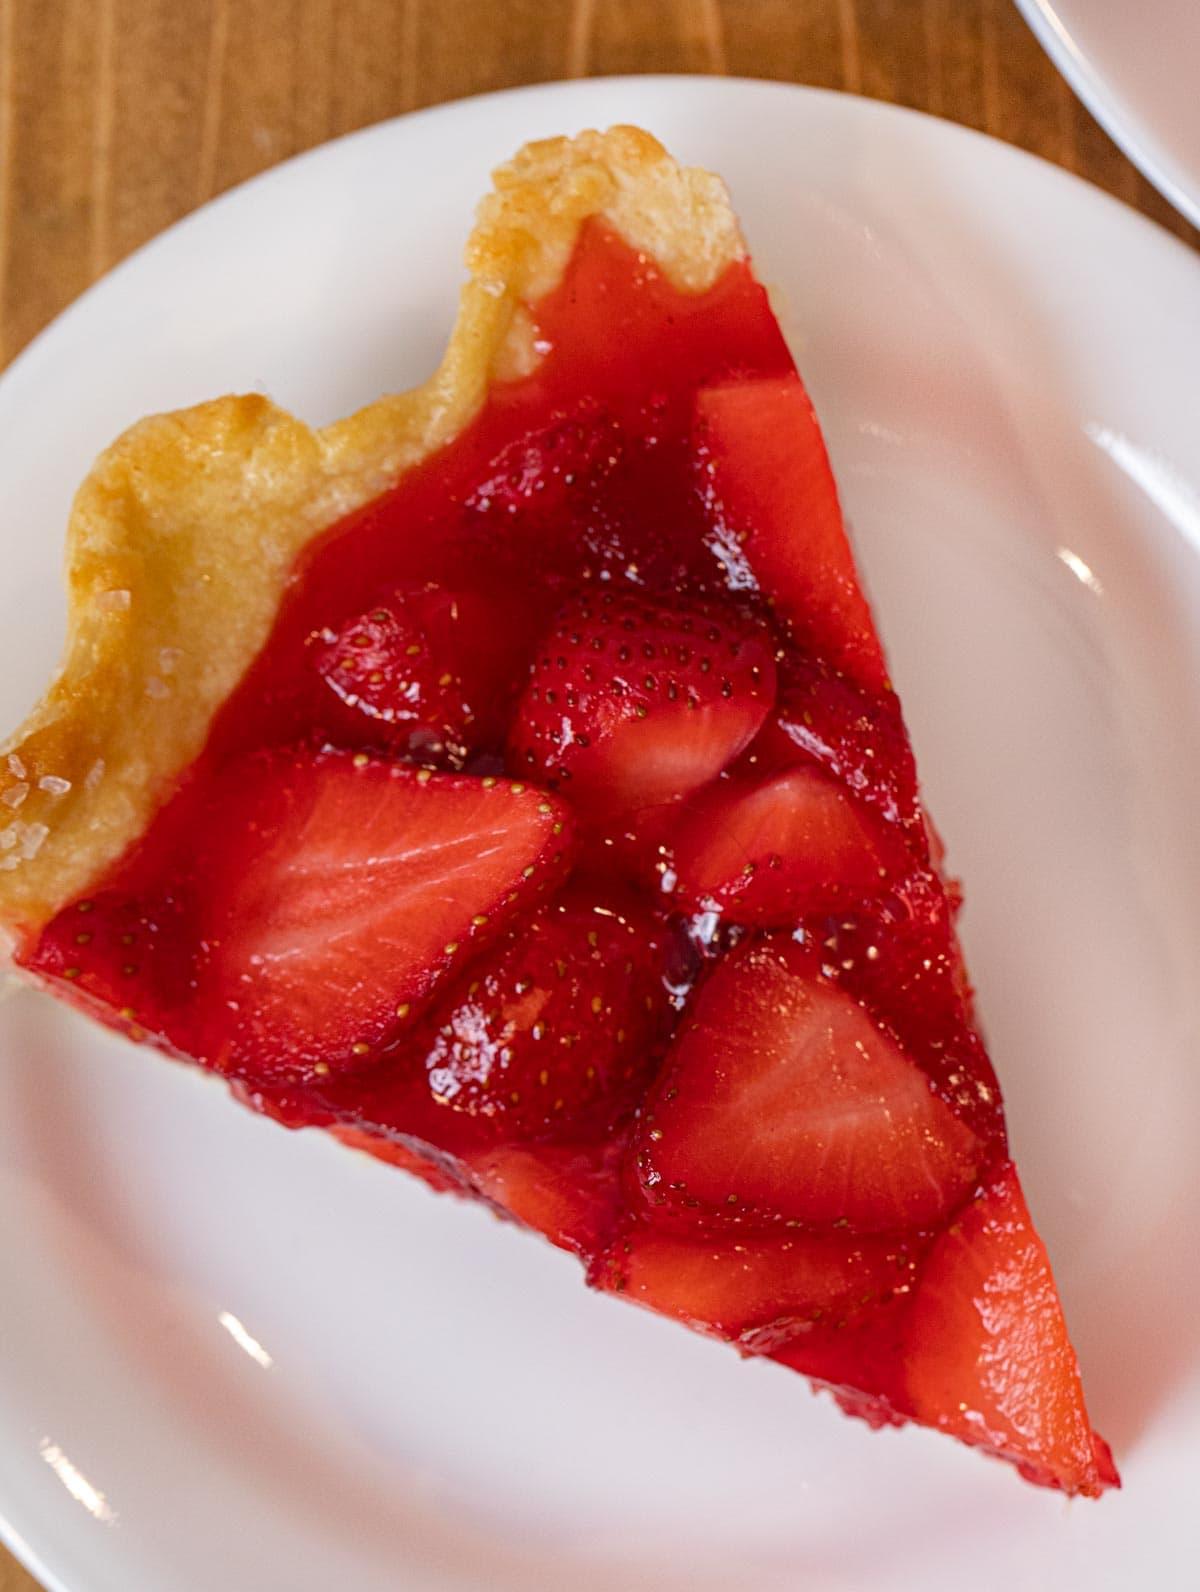 Fresh Strawberry Pie slice on plate